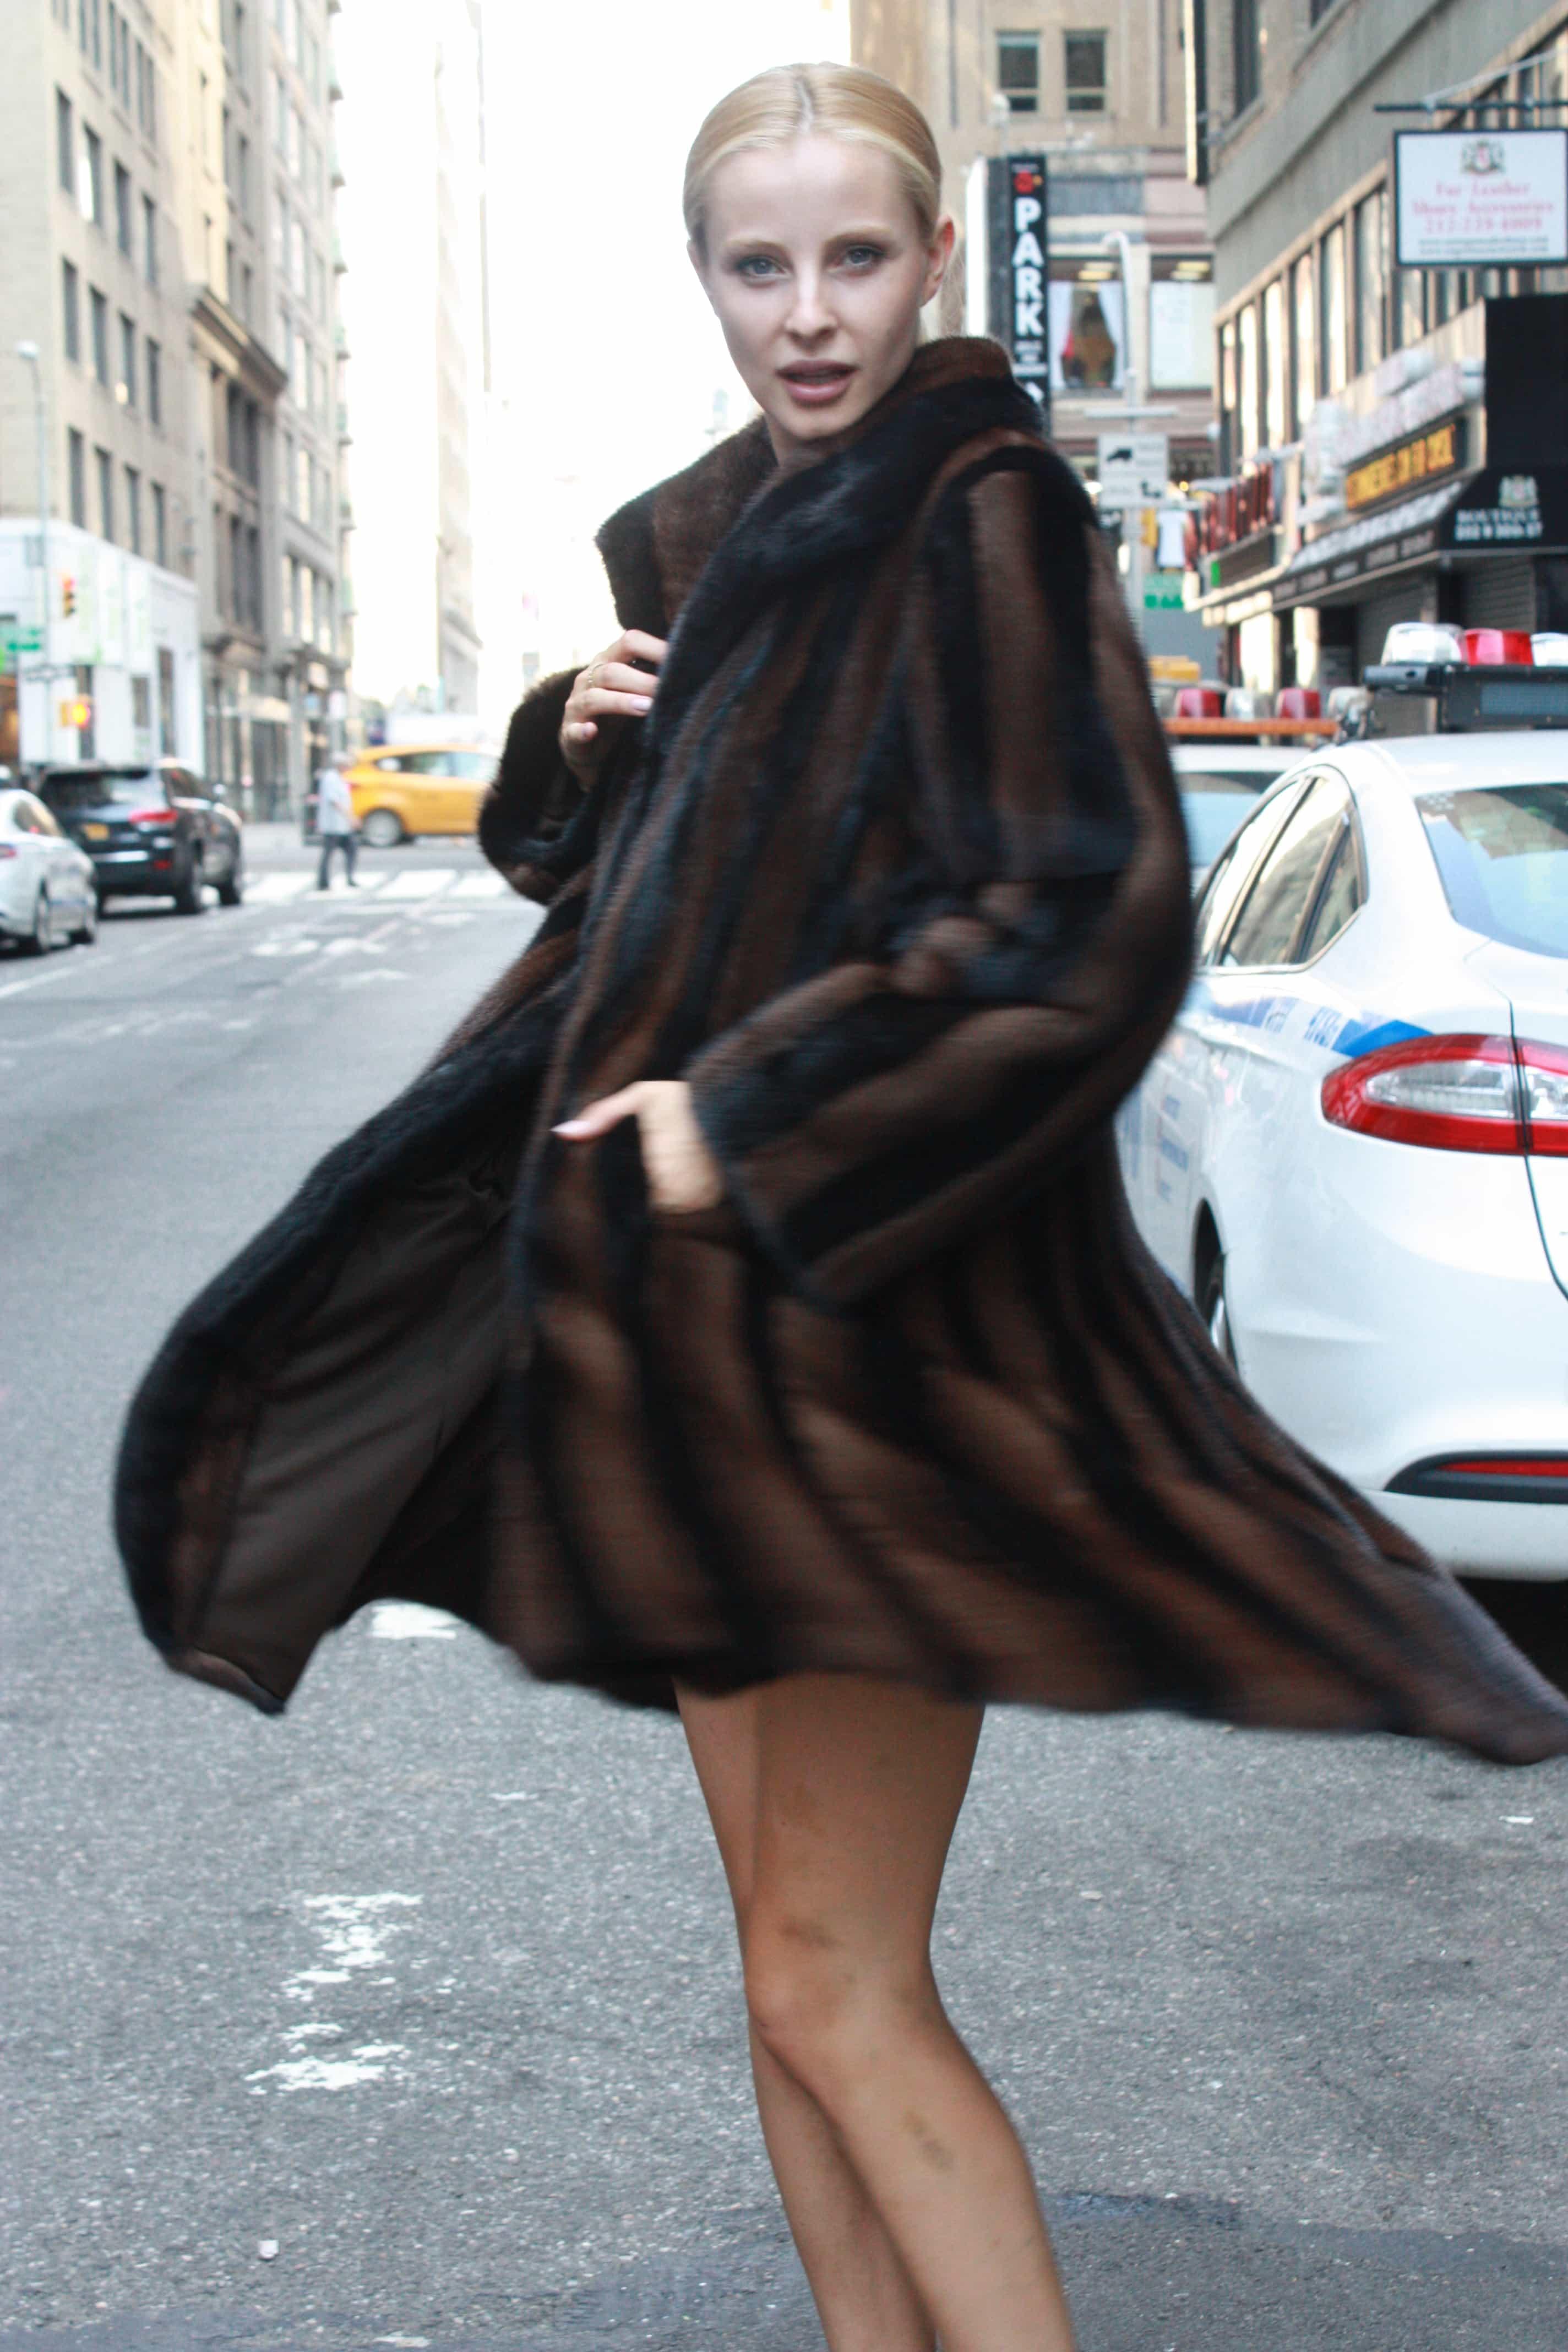 Marc Kaufman Furs Presents a black and brown mink fur swing stroller from Marc Kaufman Furs New York,Argentina,United Kingdom,Austria,Denmark,Norway,Australia,Finland,Saudi Arabia,Oman,Kuwait,Jordan,Egypt